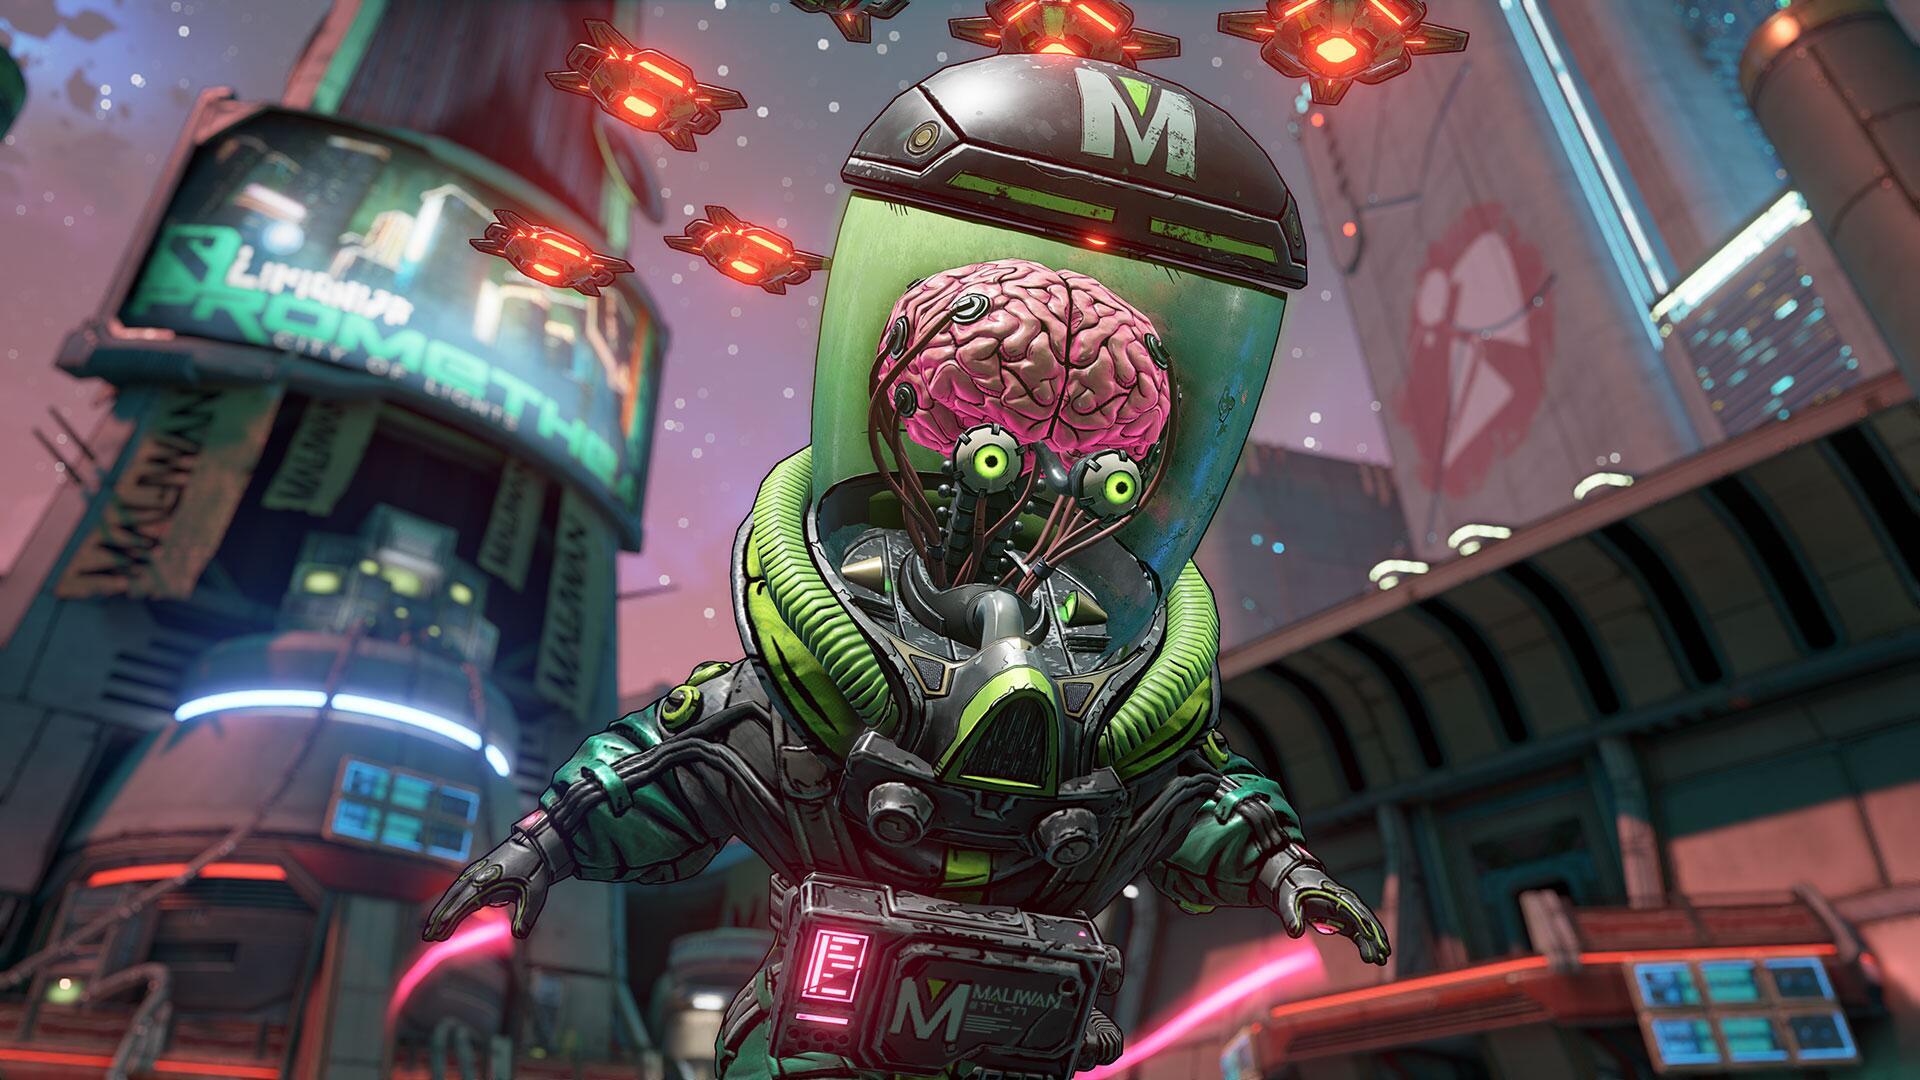 Bild zu Borderlands 3, Loot, Shooter, Gearbox, PC, Xbox One, PS4, Beute